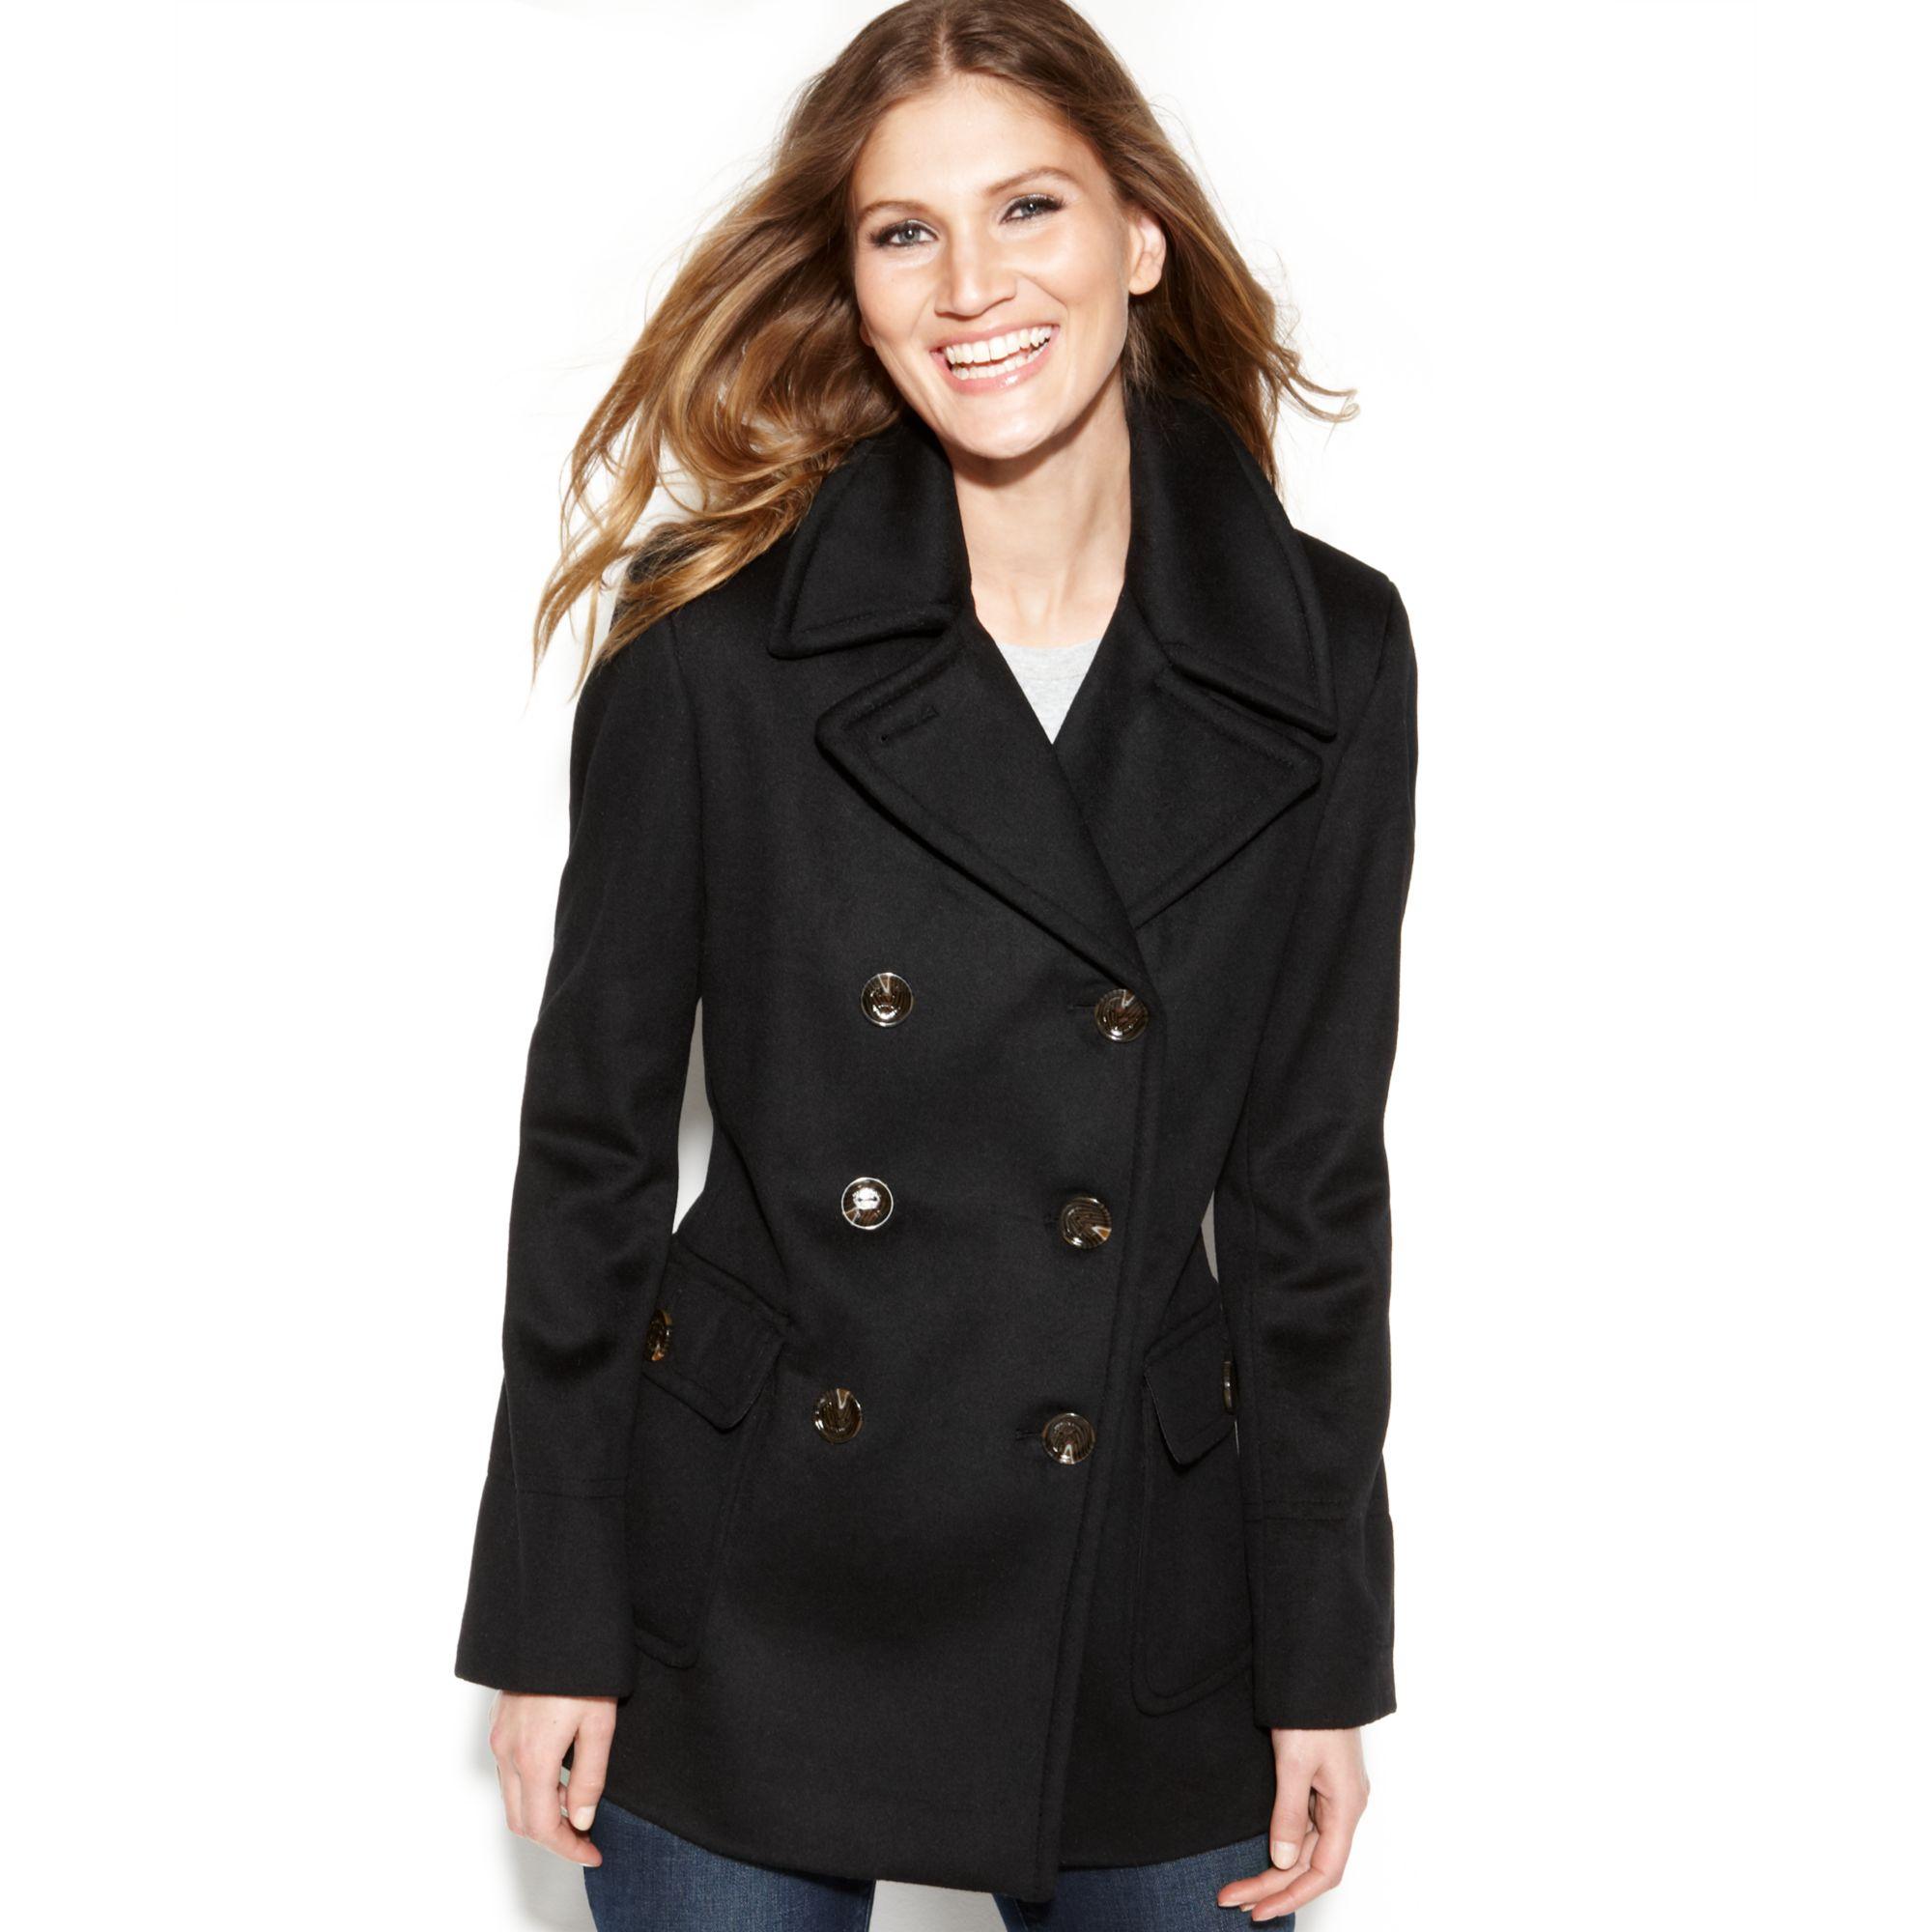 Calvin Klein Wool Blend Double Breasted Pea Coat In Black